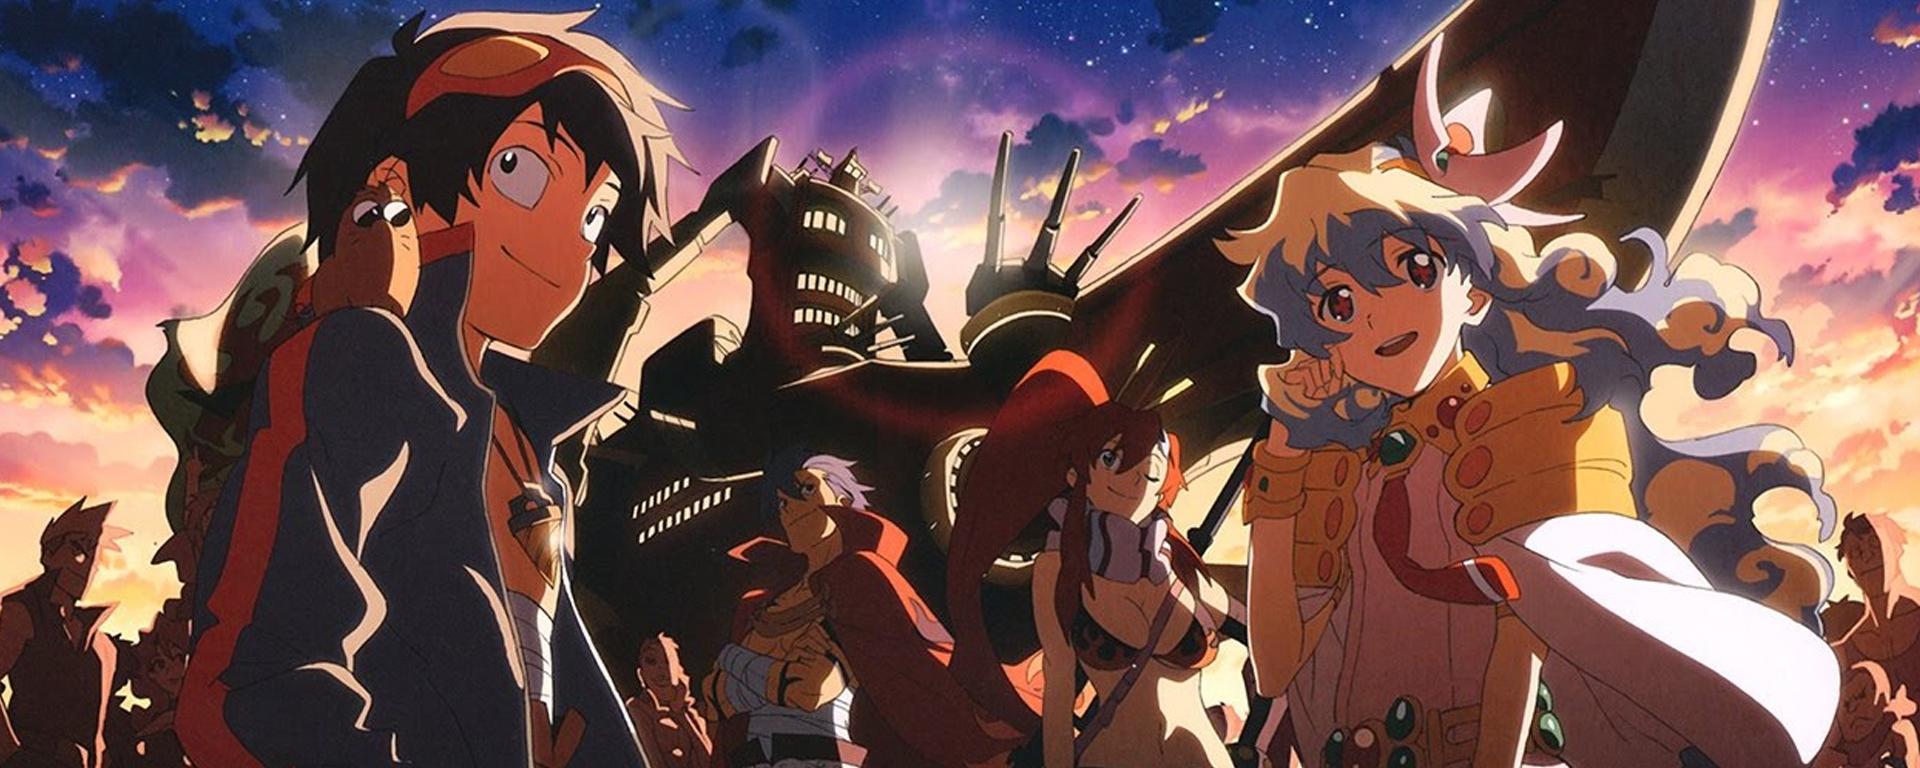 Best anime openings endings sorairo days shoko nakagawa